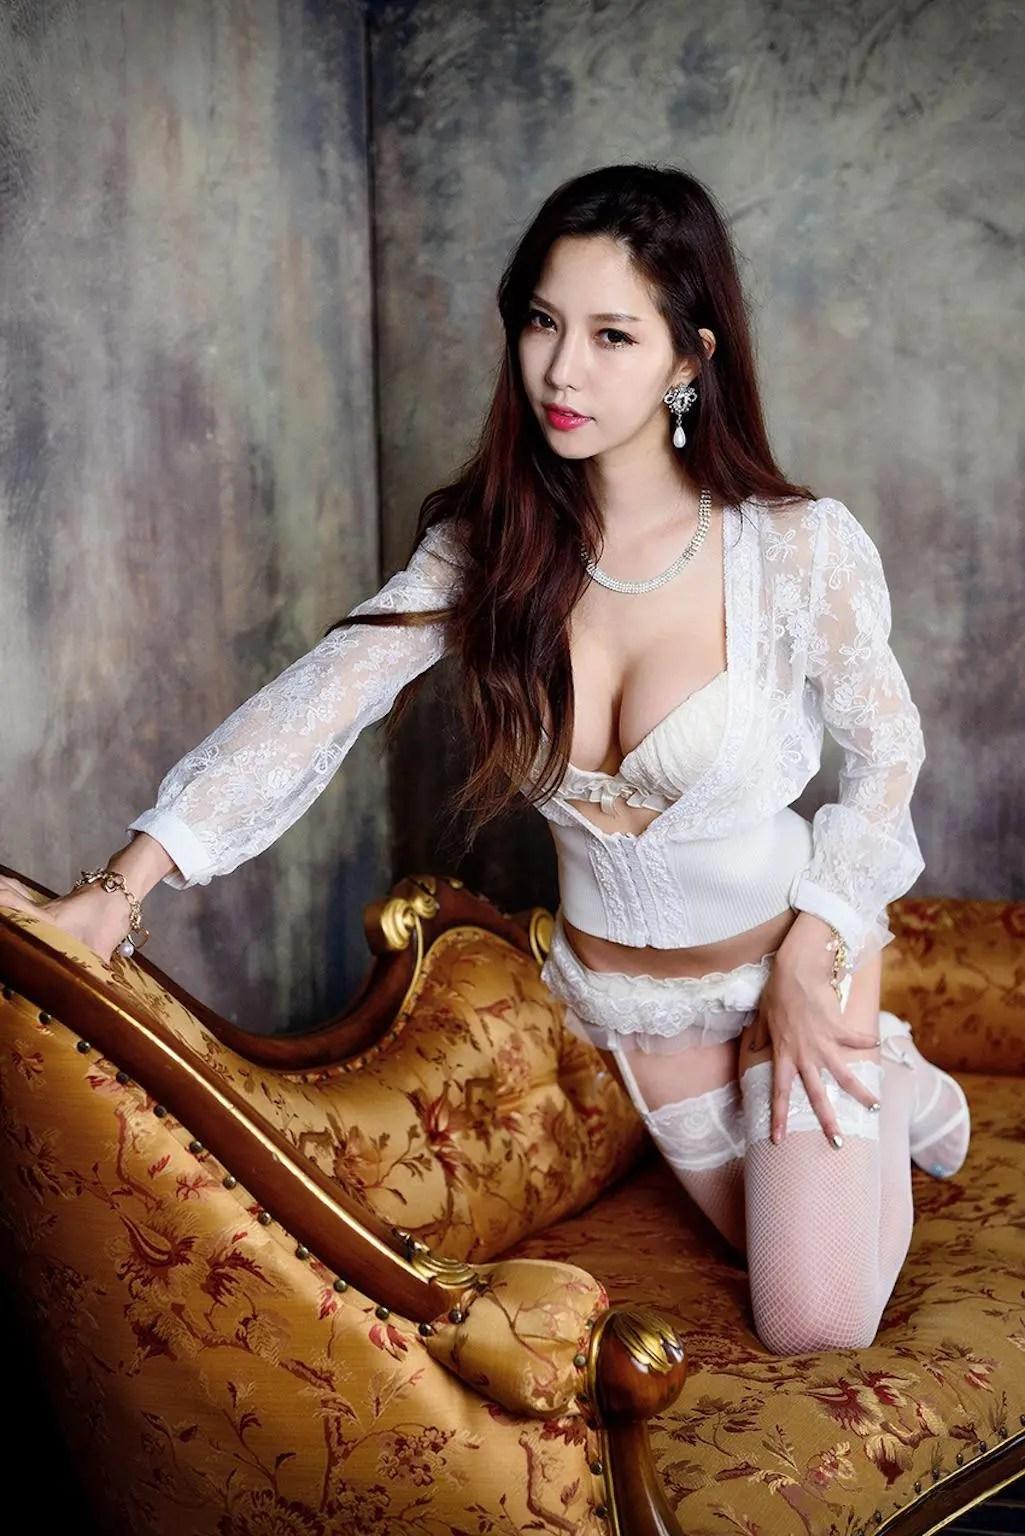 Han Min Young (한민영)